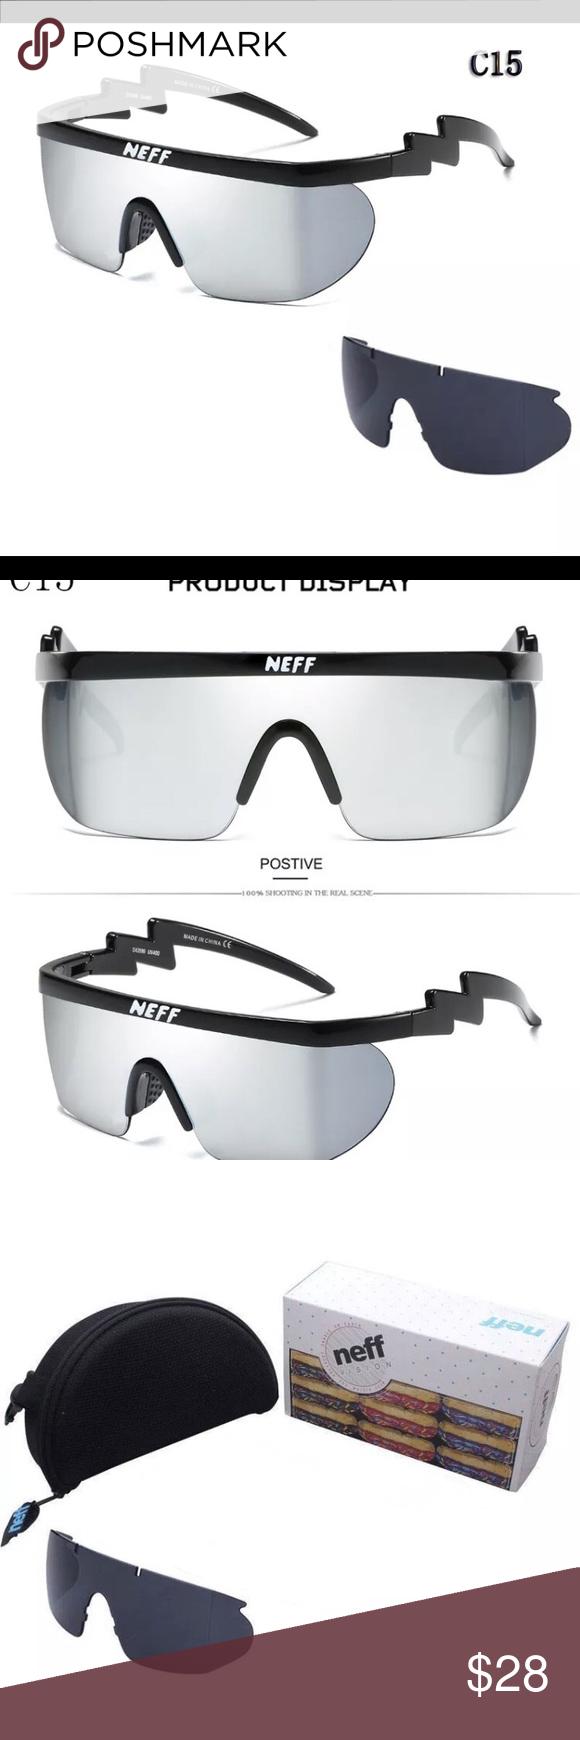 07fce532fb961 Neff Brodie  Riff Raff  Sunglasses ~ C15